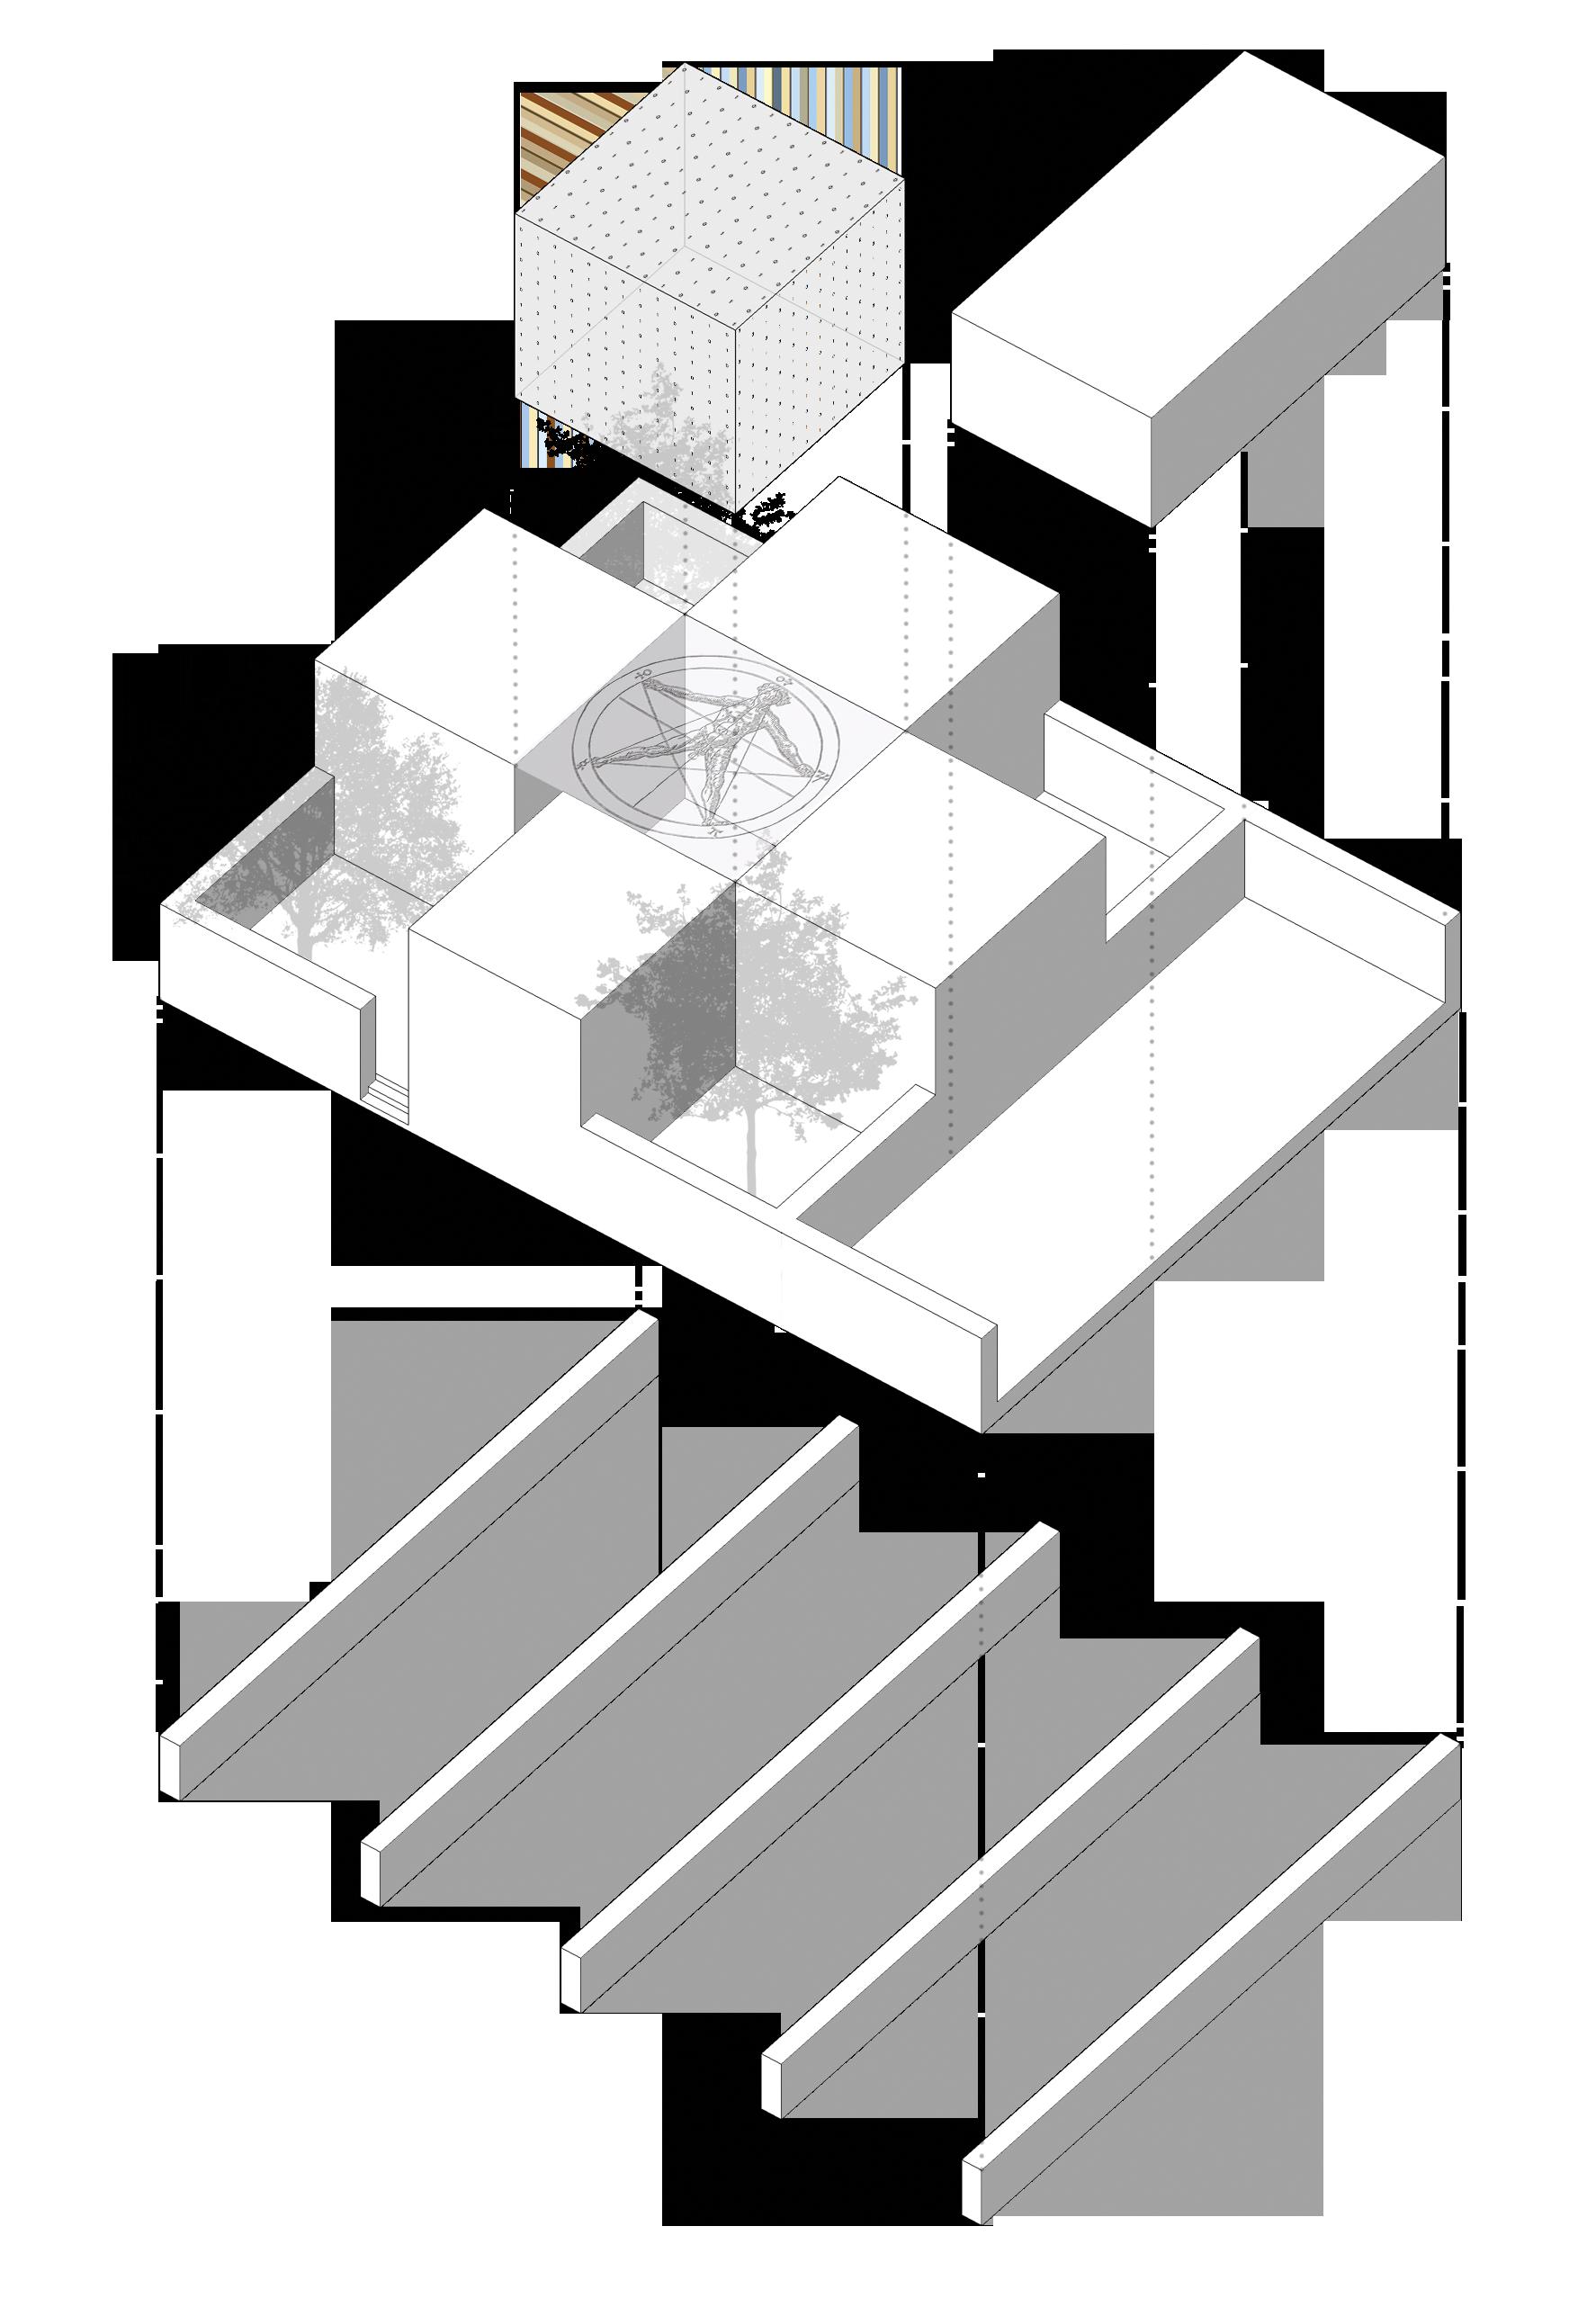 fundamental grid, woning, intermediate ruimte en add-on ruimte